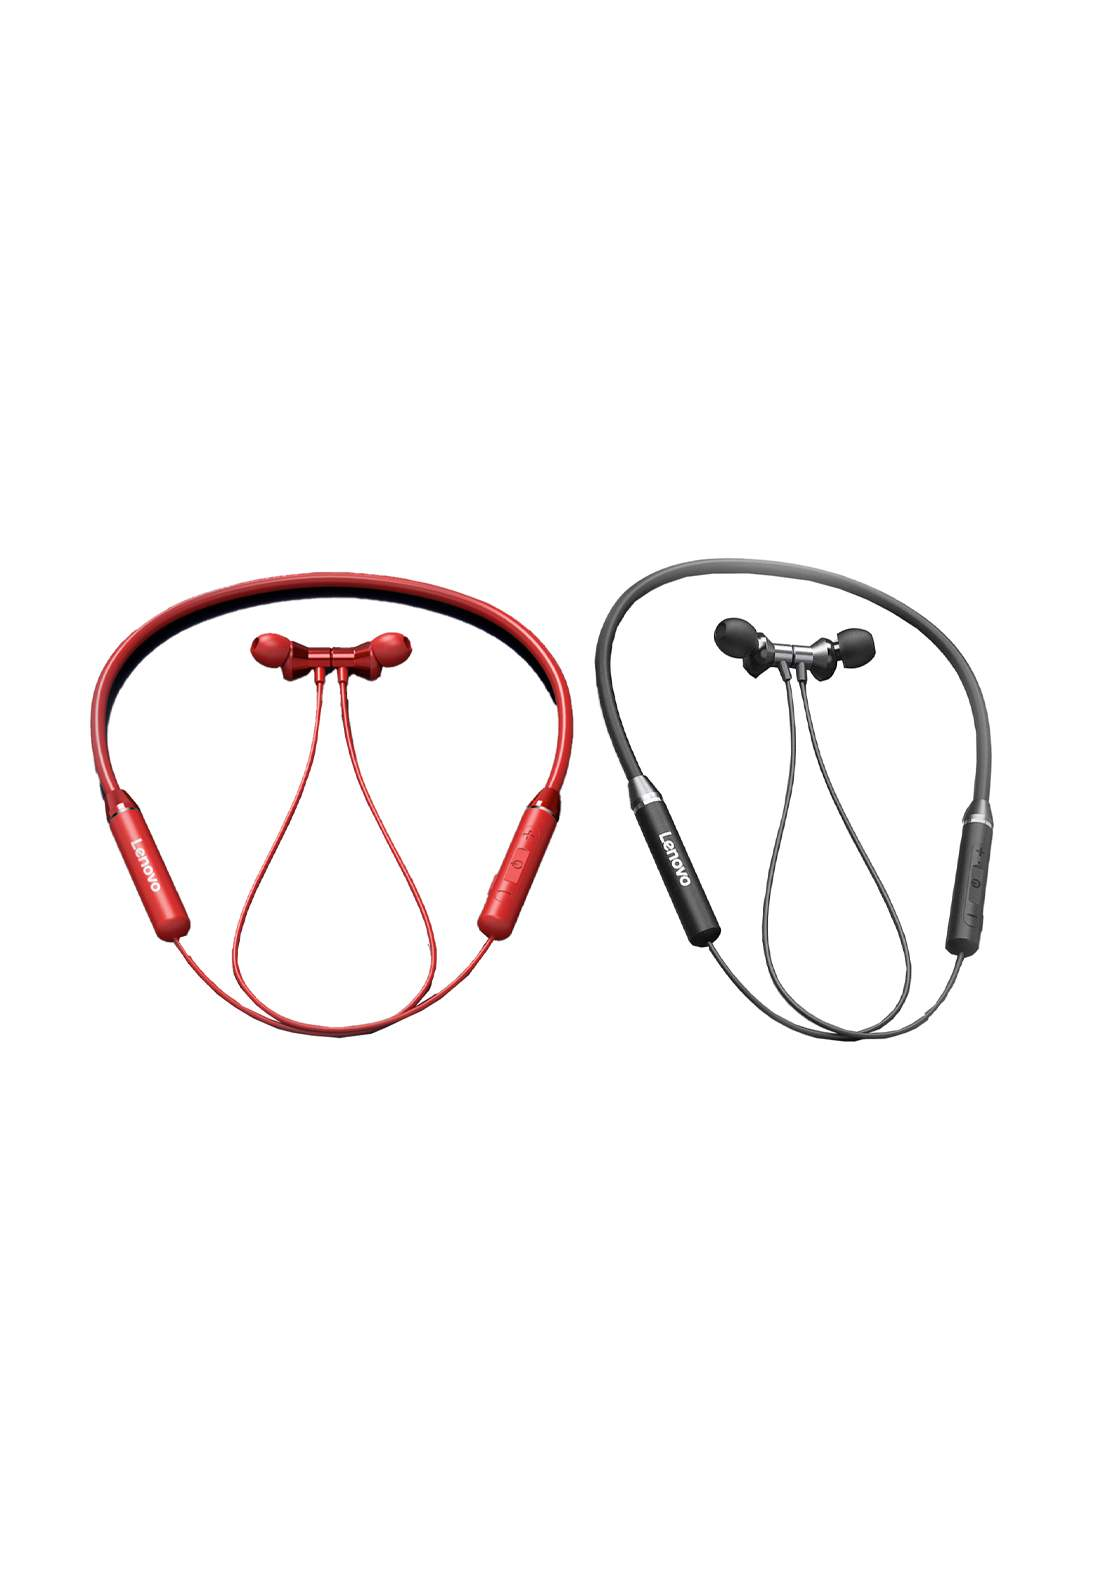 S11 TWS Wireless Bluetooth Earbuds سماعة لا سلكية